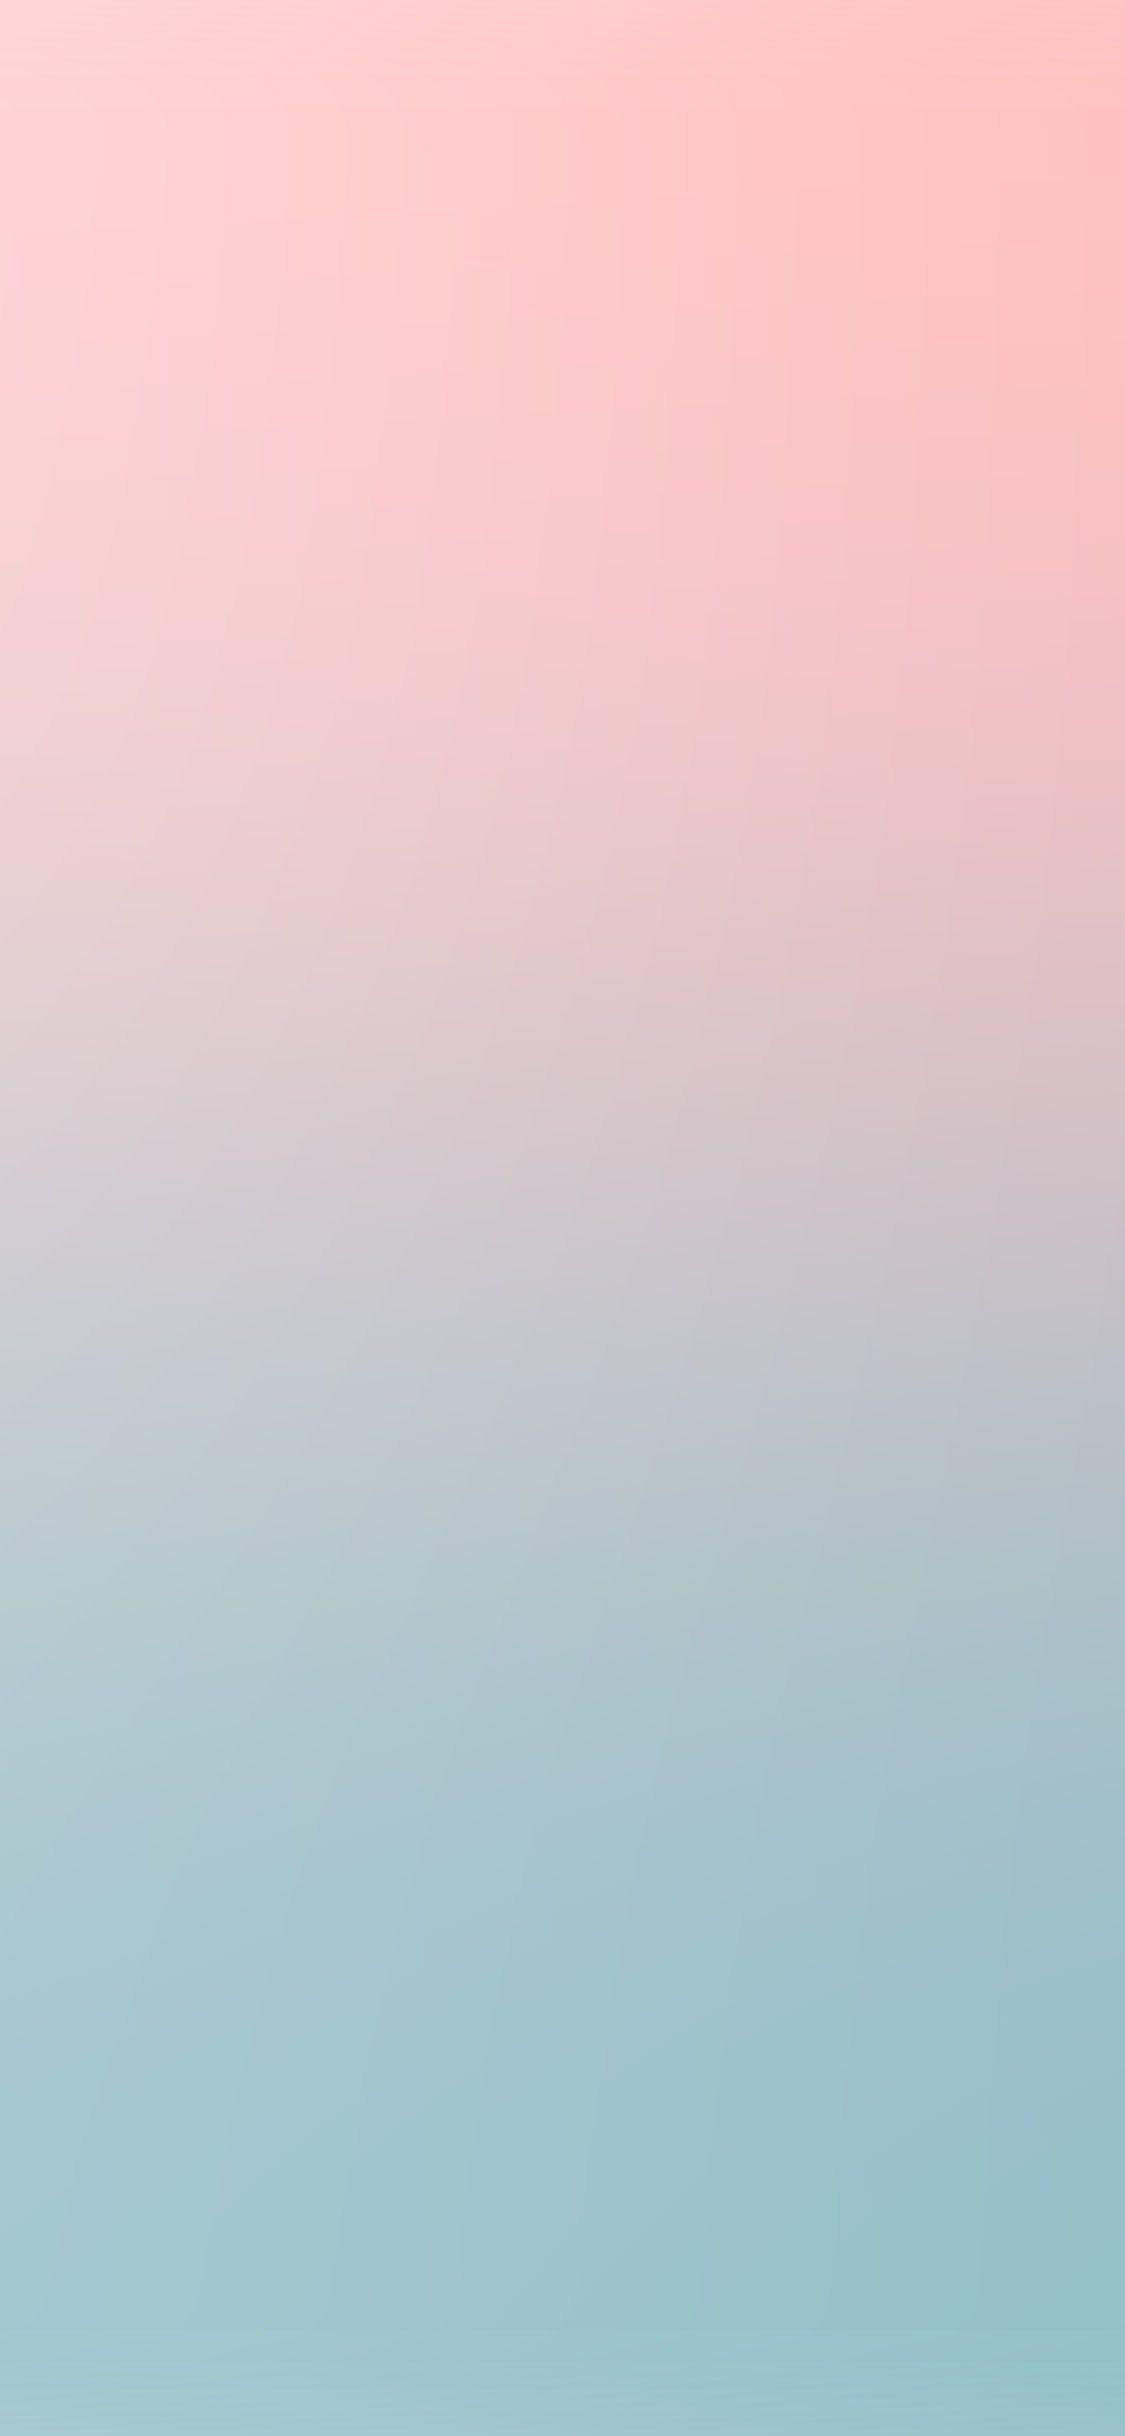 Iphonex Wallpaper Sm07 Pink Blue Soft Pastel Blur Gradation Sfondi Per Iphone Sfondi Iphone Sfondi Carini